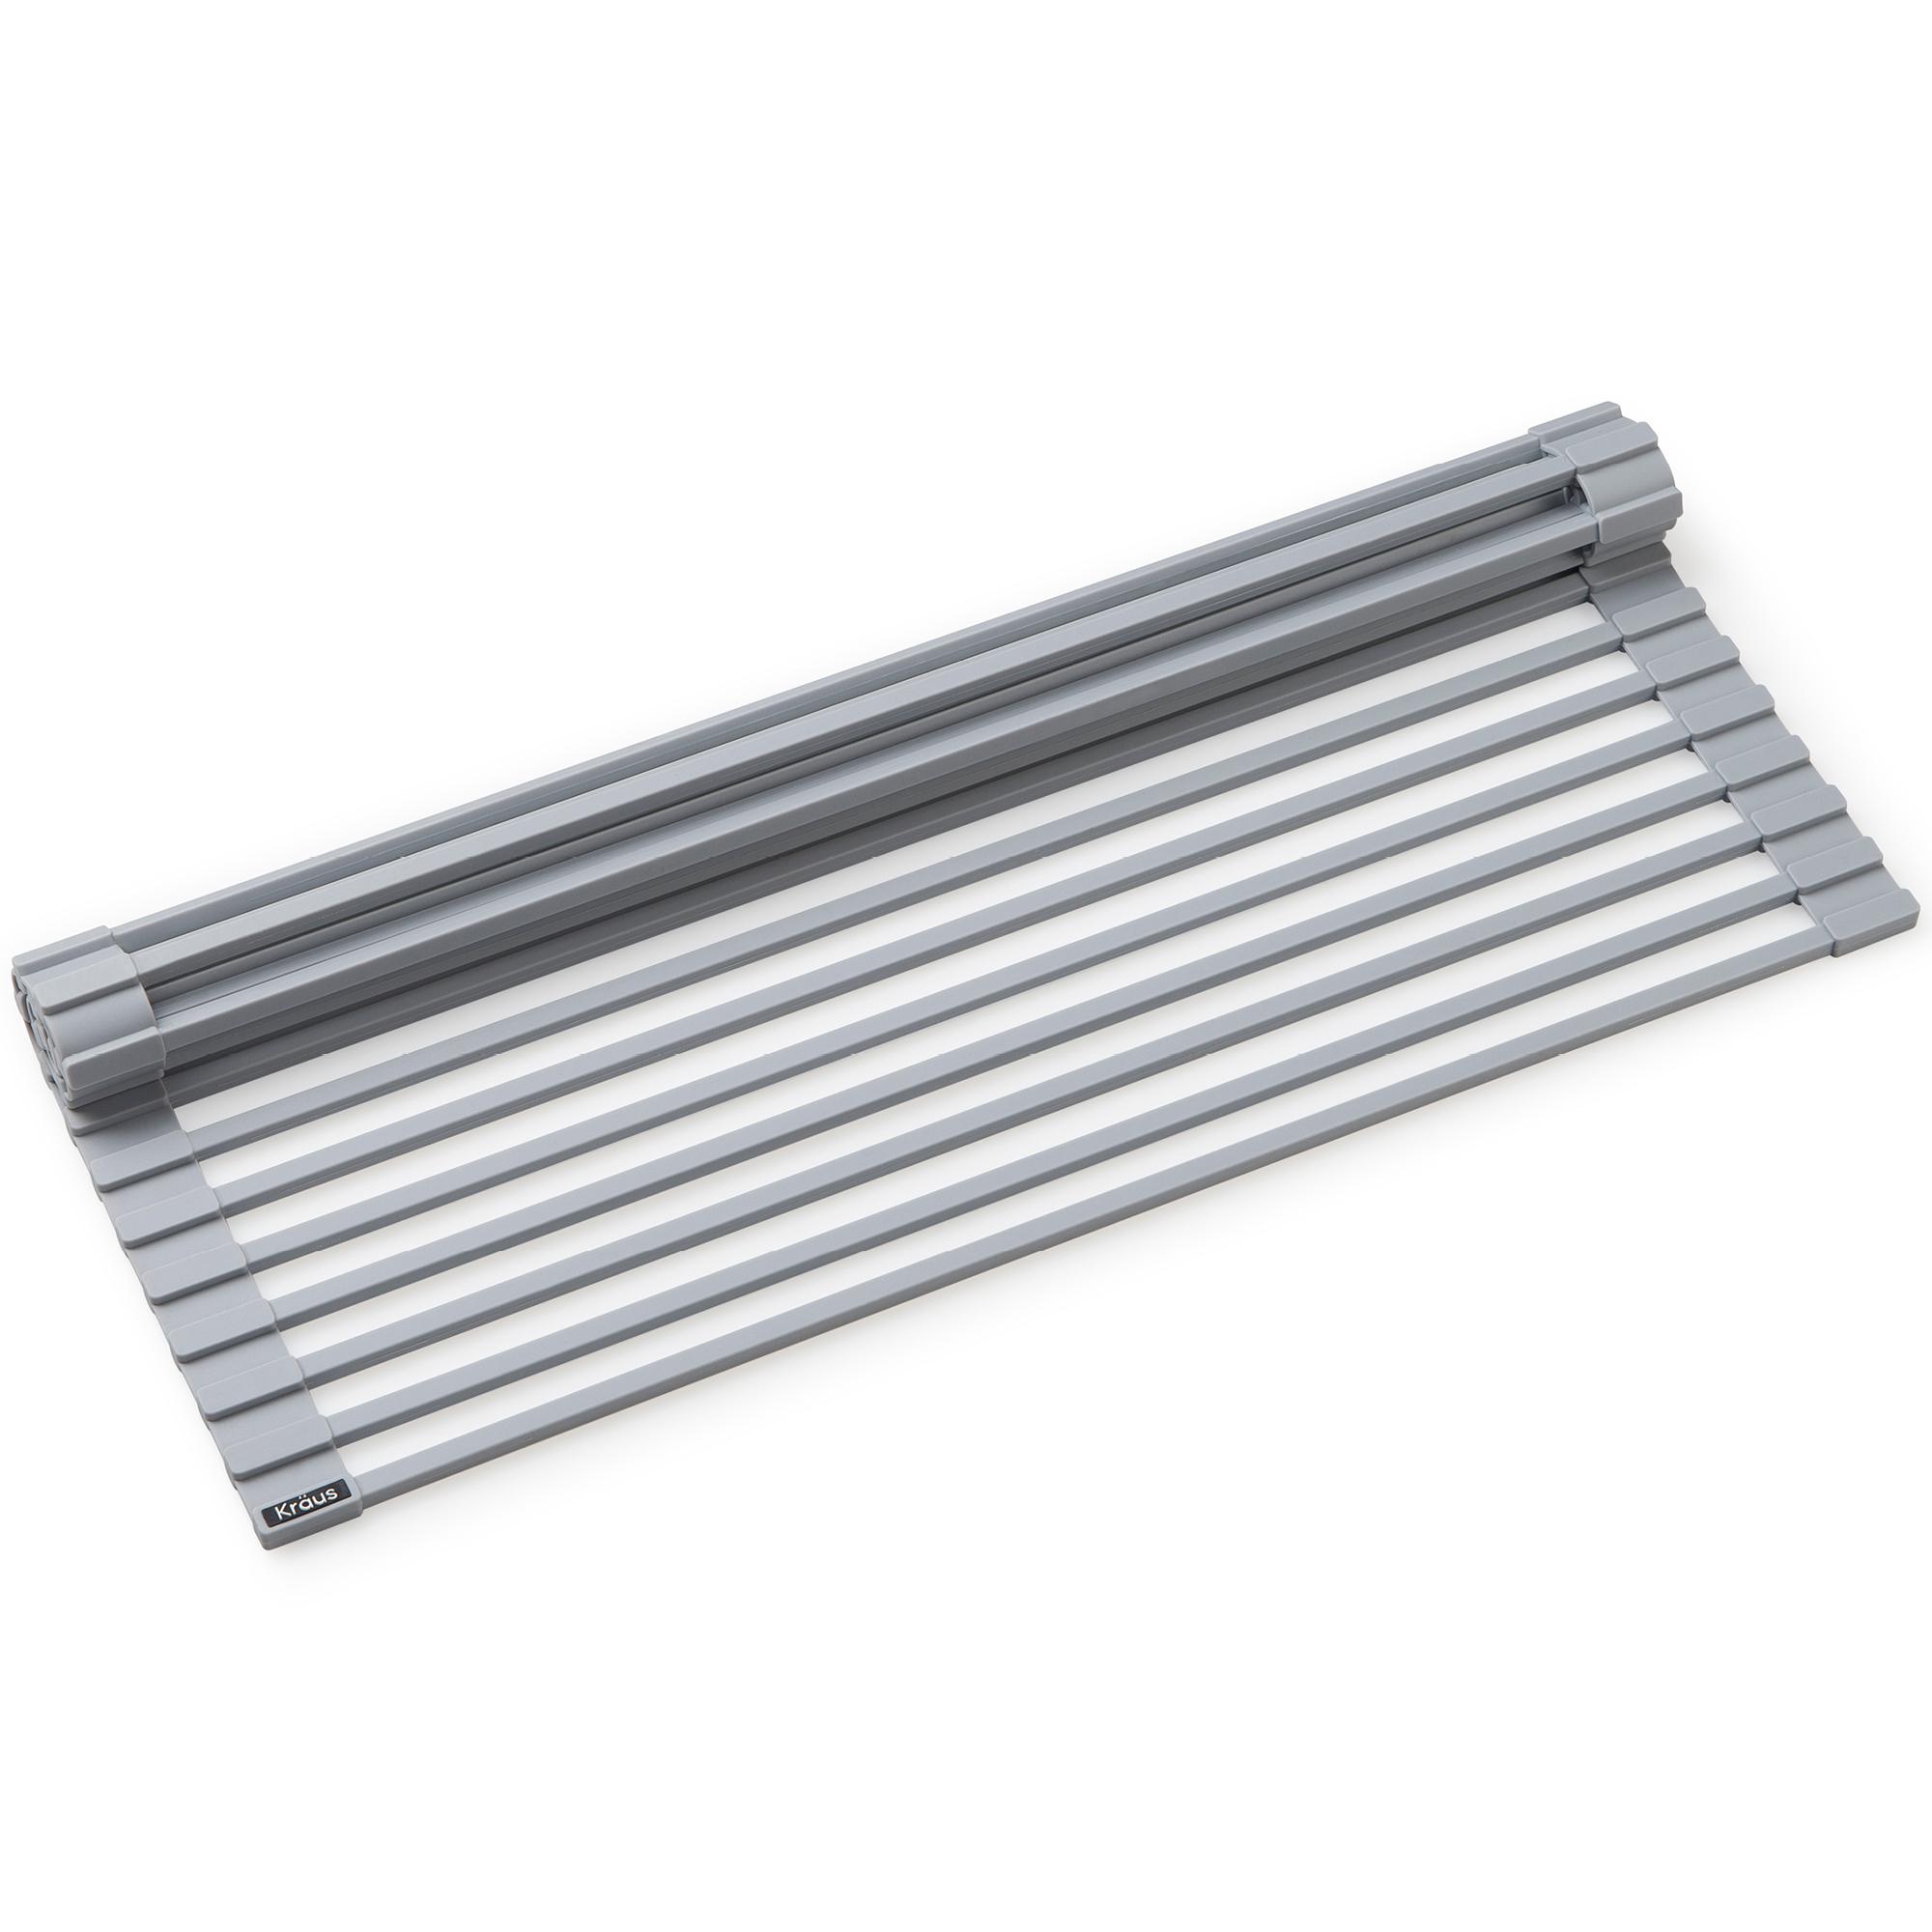 Kraus KRM-10GREY KRAUS Multipurpose Over Sink Roll-Up Dish Drying Rack in Grey